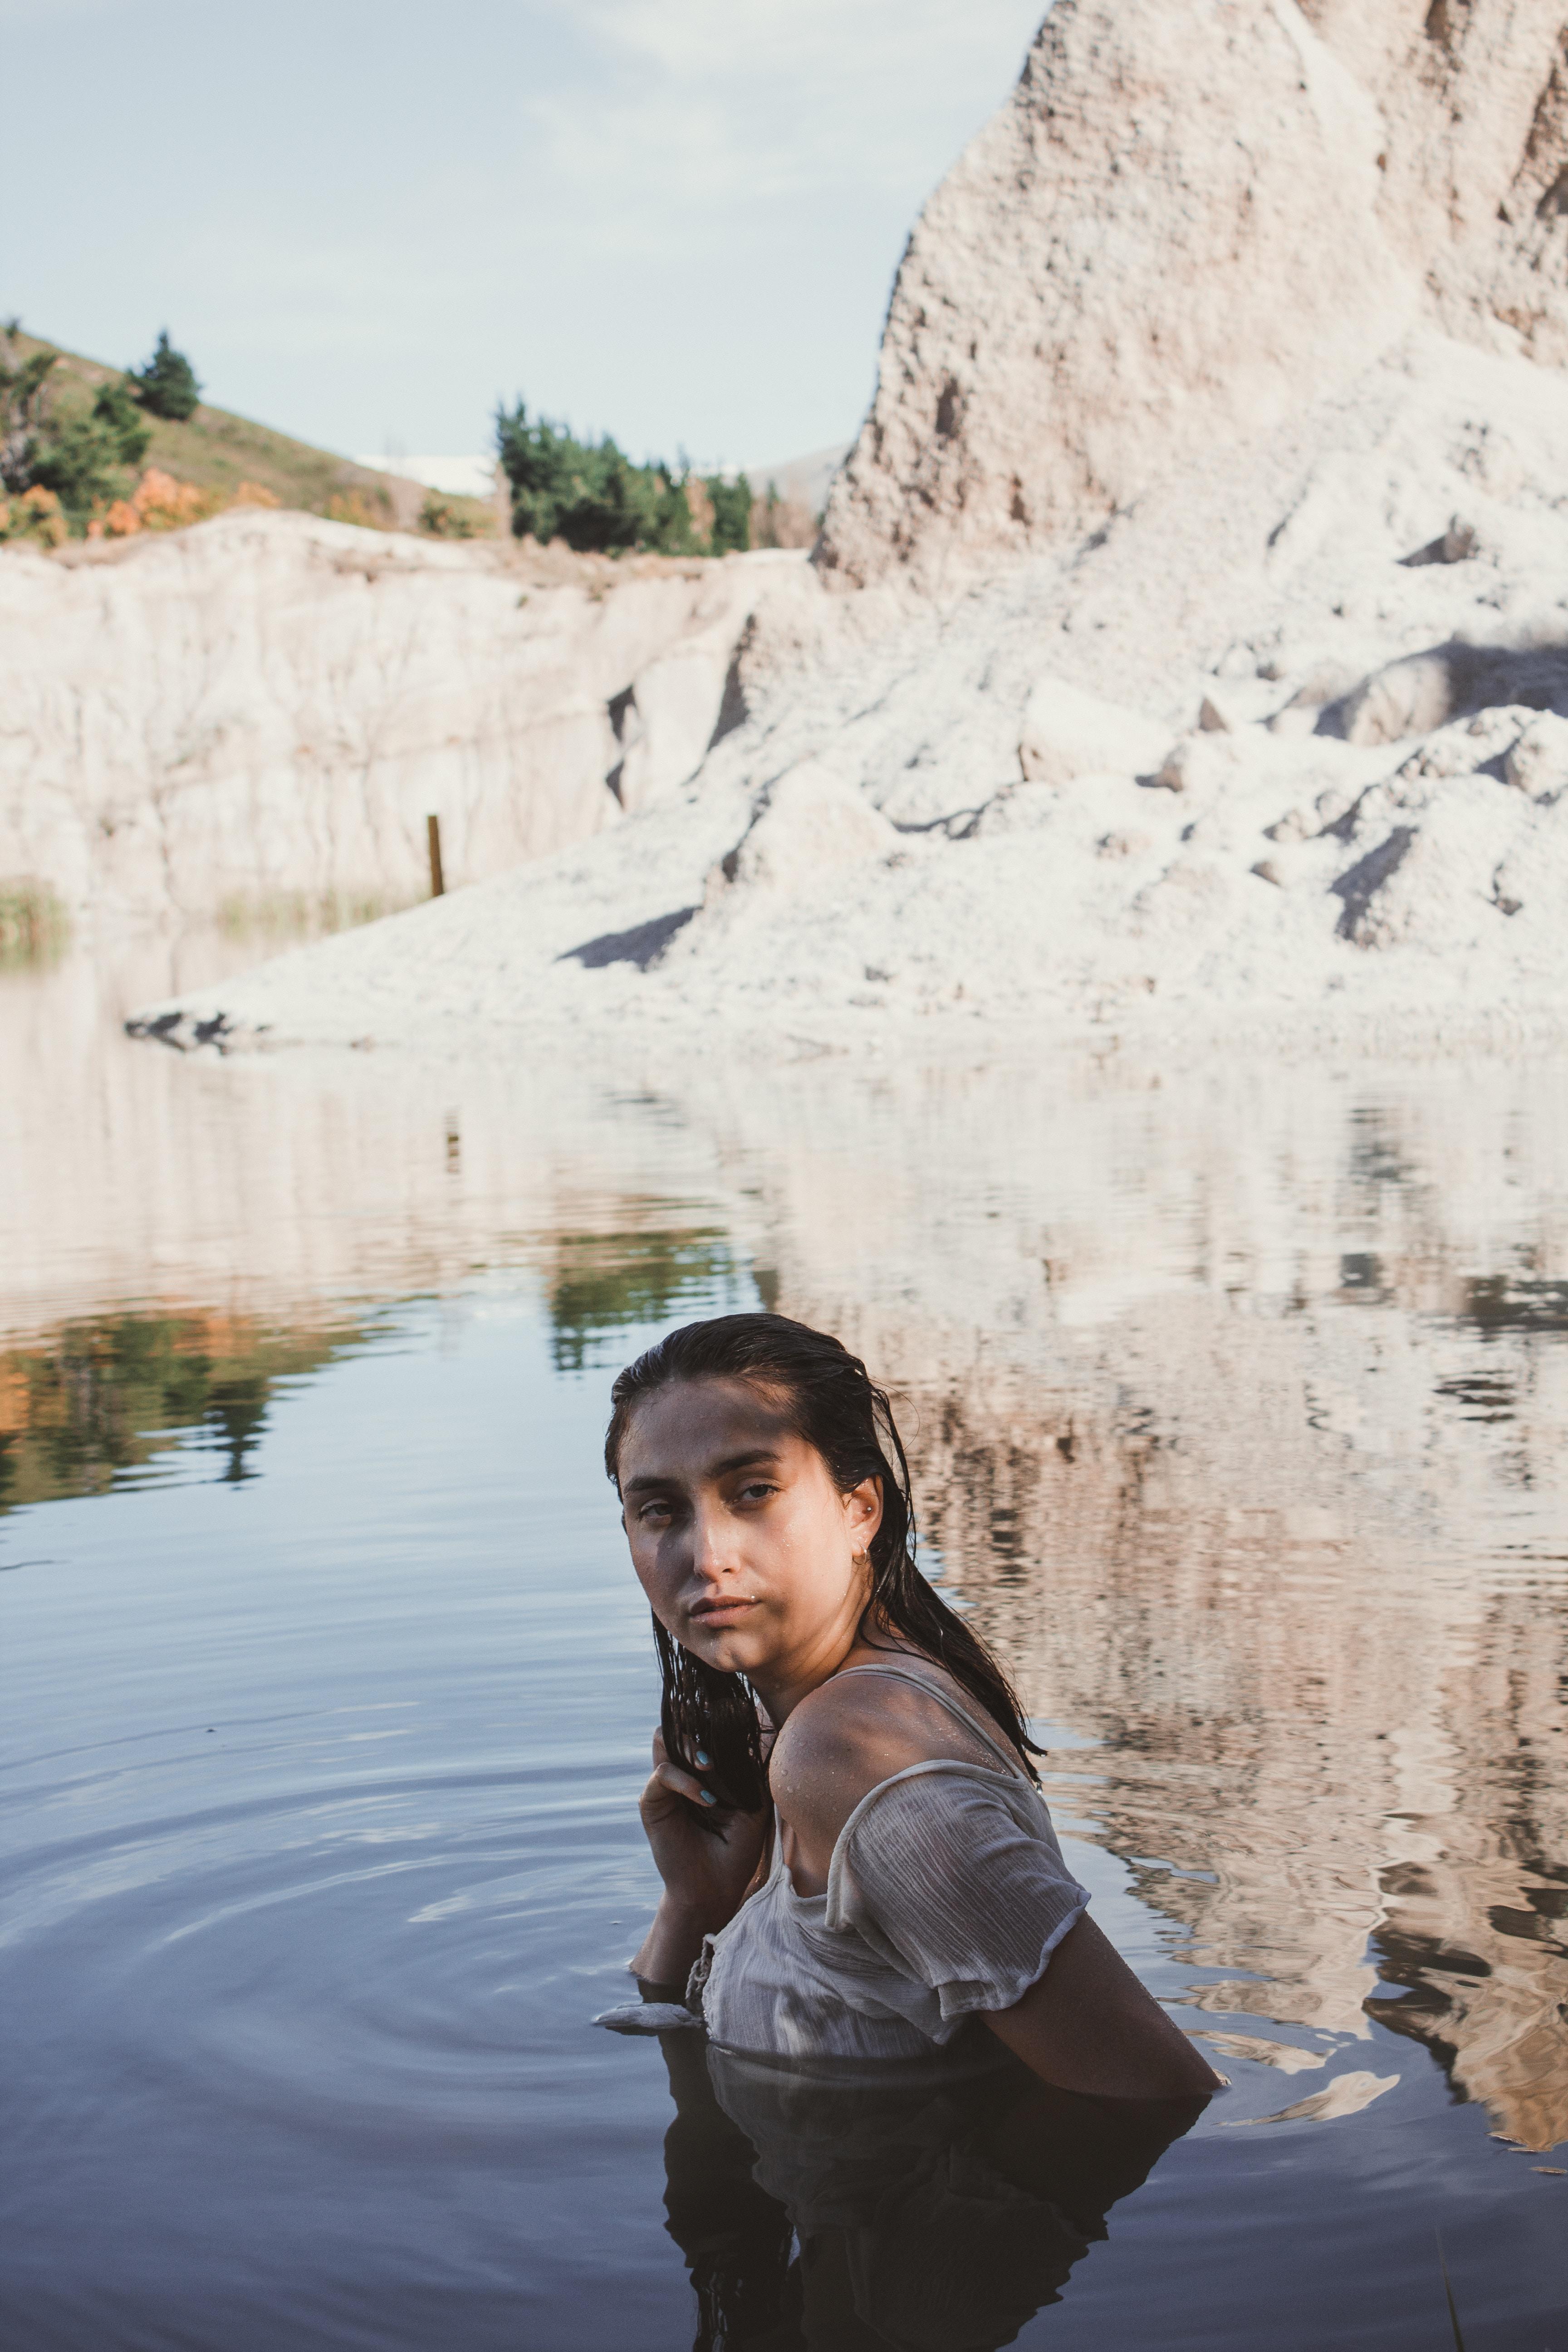 woman wearing white top soaking in water